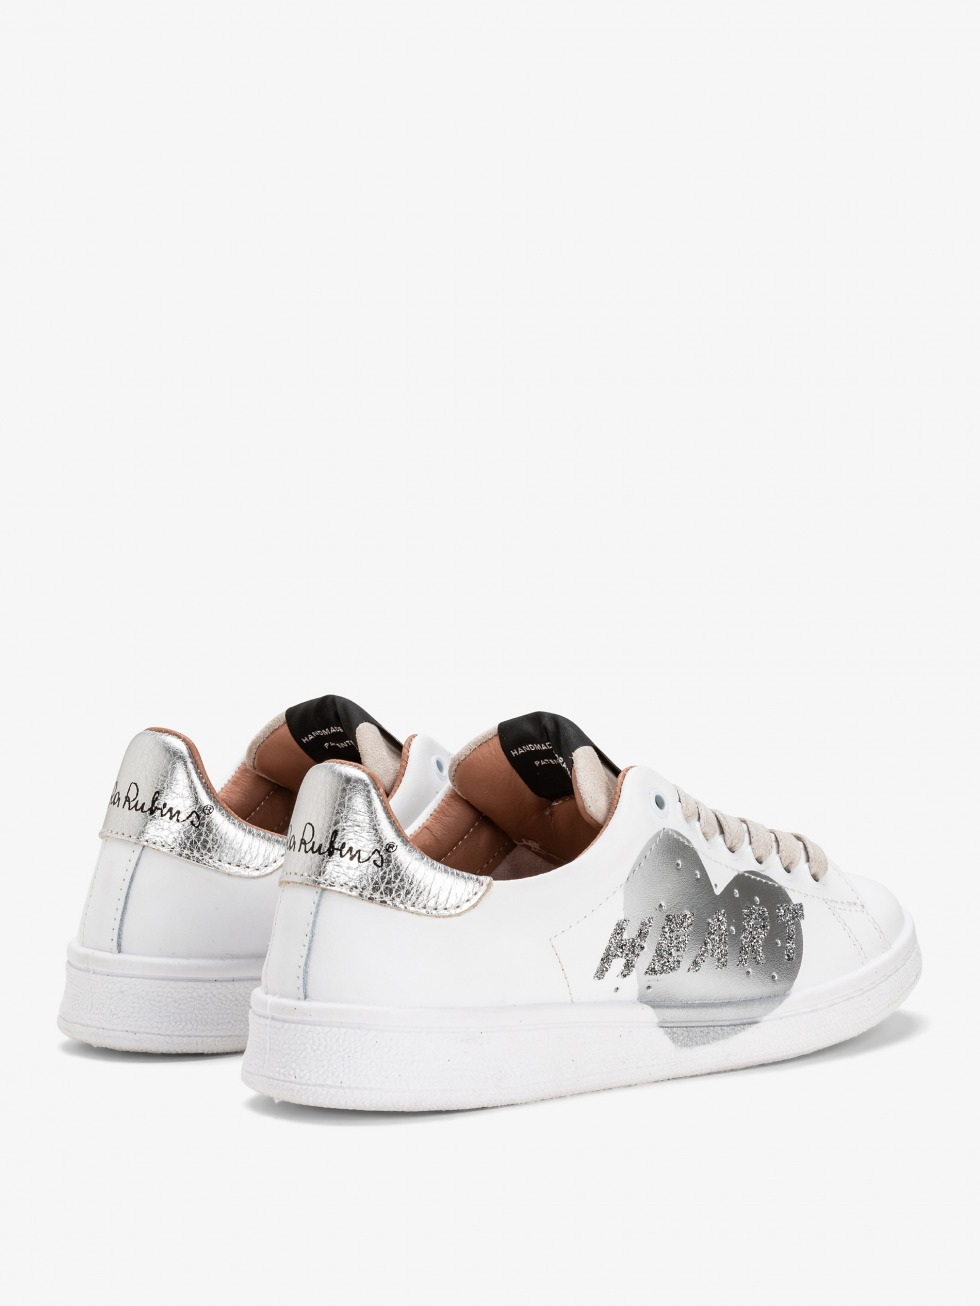 Daiquiri Sneakers - Moon Silver Race Heart